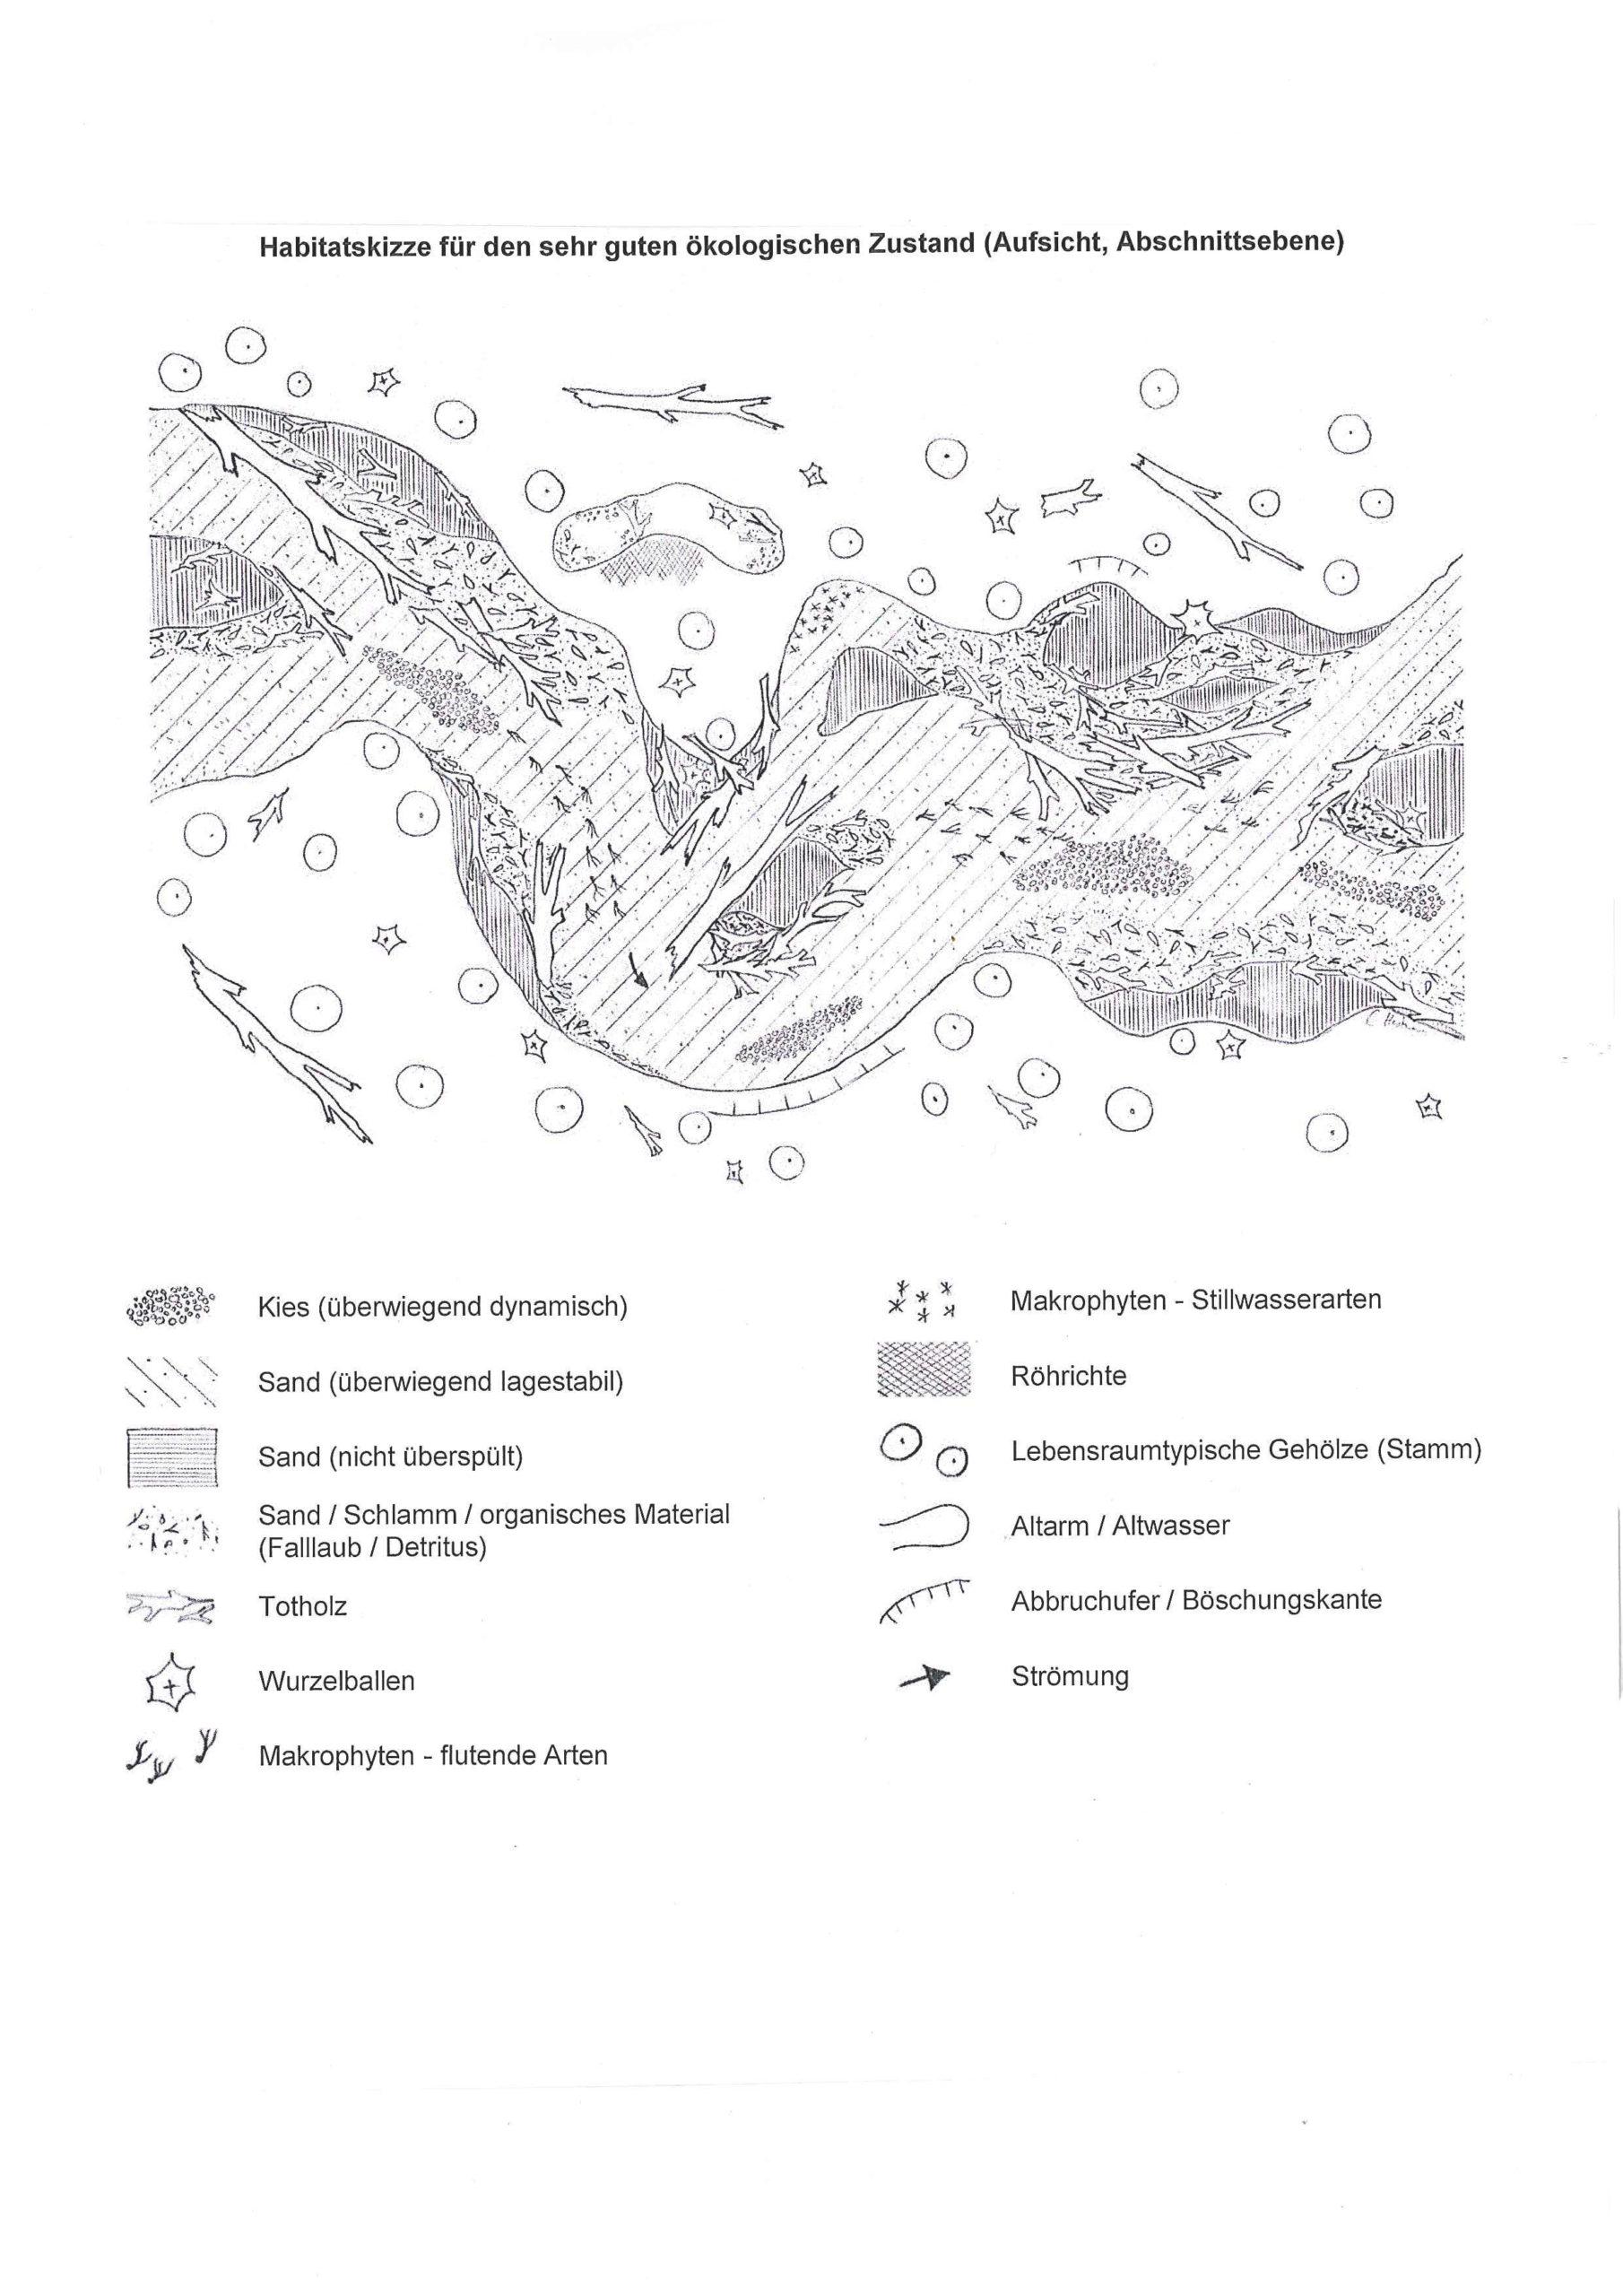 Habitatskizze sandgeprägte Tieflandbäche (Typ14)